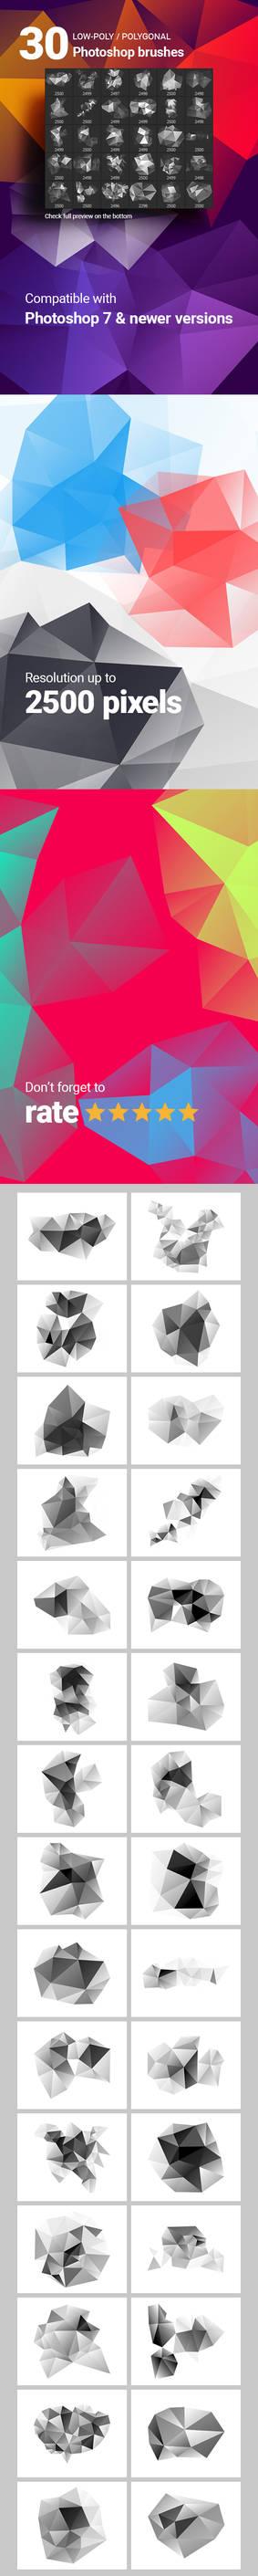 Low-Poly Polygonal Geometrical Photoshop Brushes